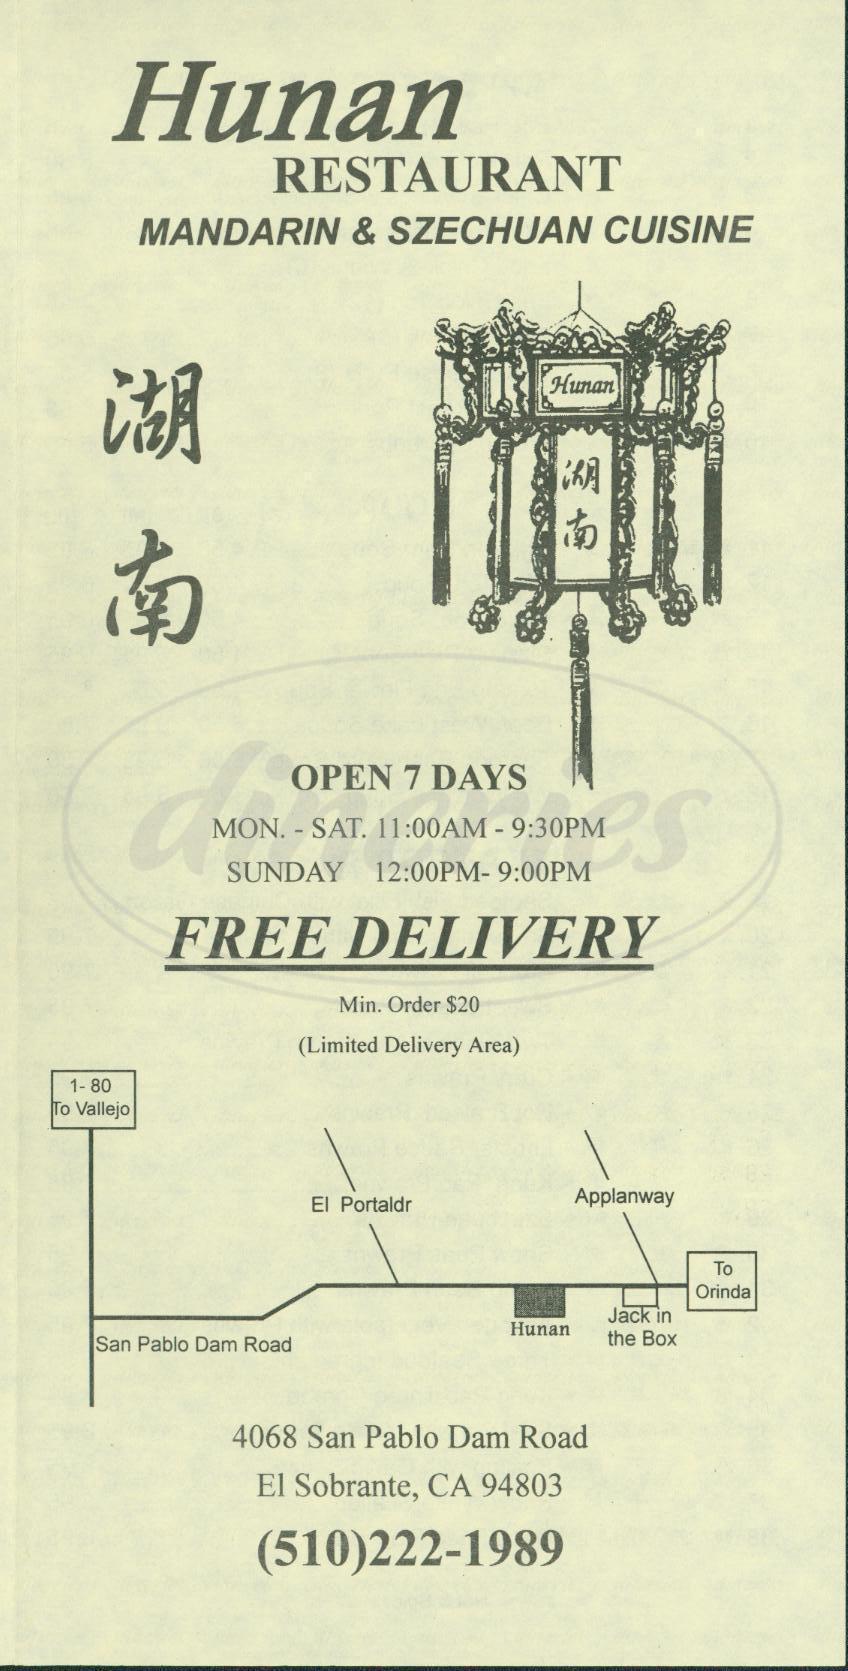 menu for Hunan Restaurant